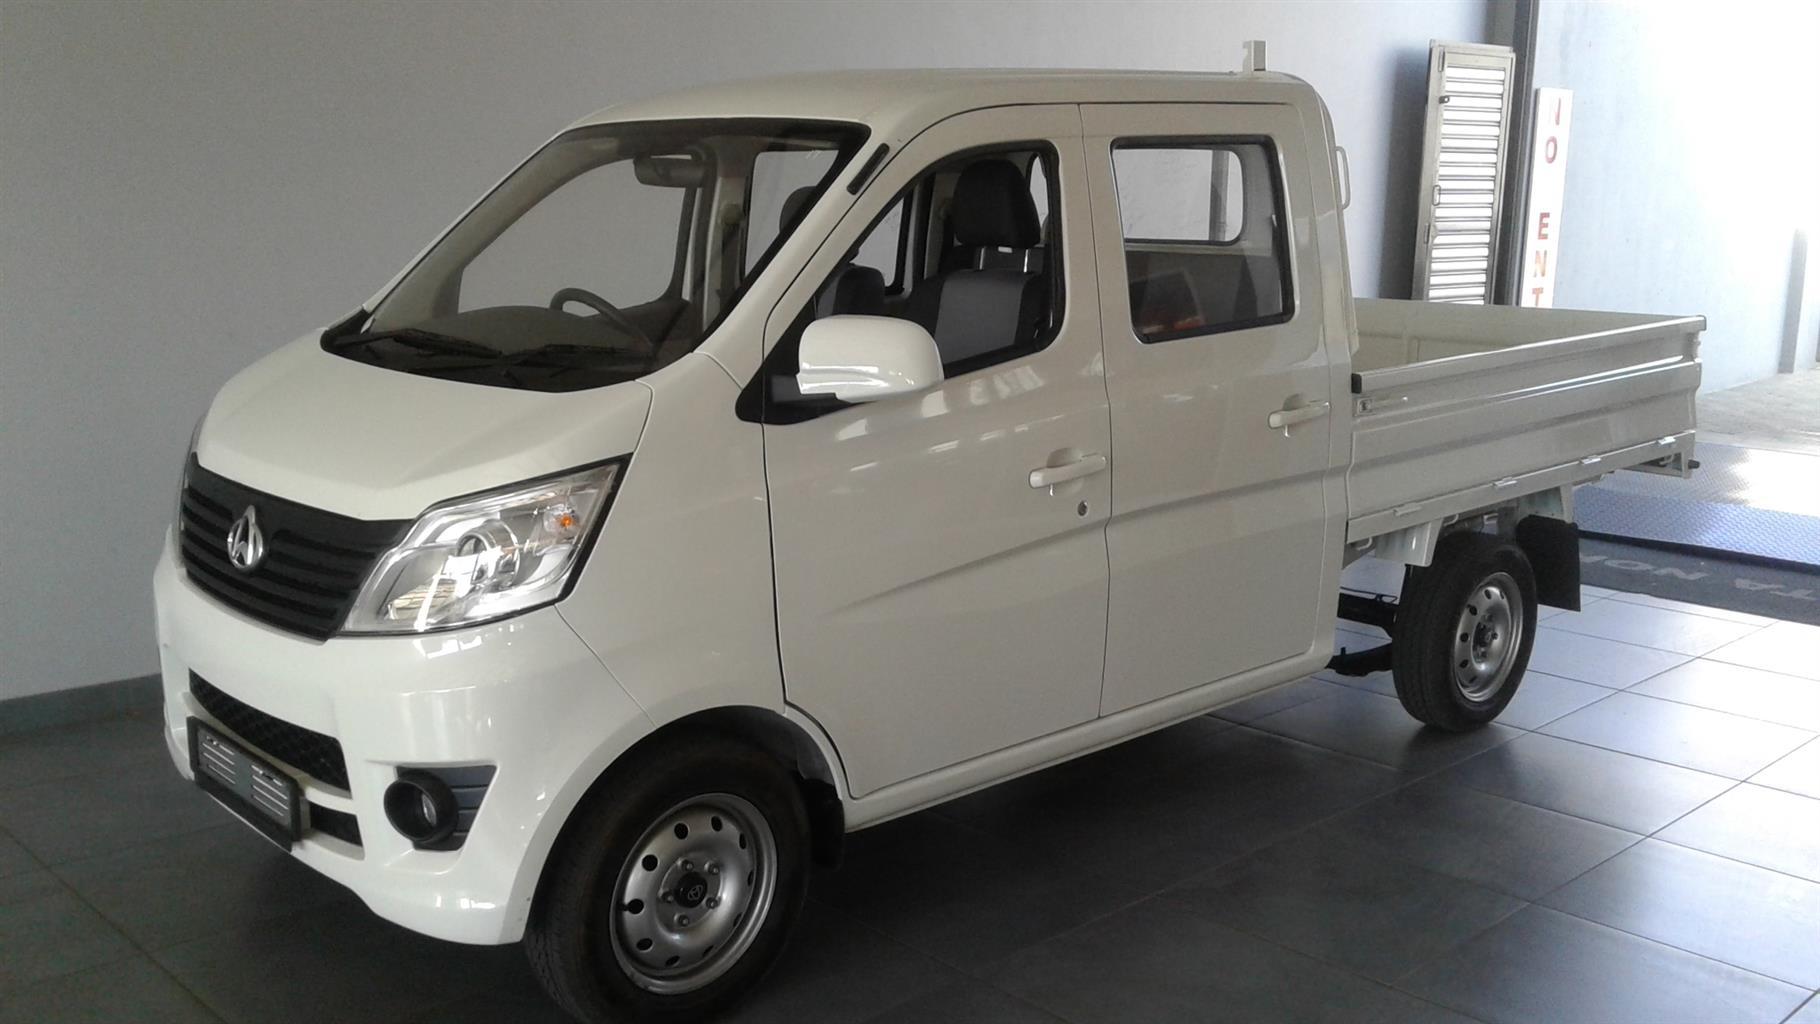 2018 Chana Star 1.3 double cab